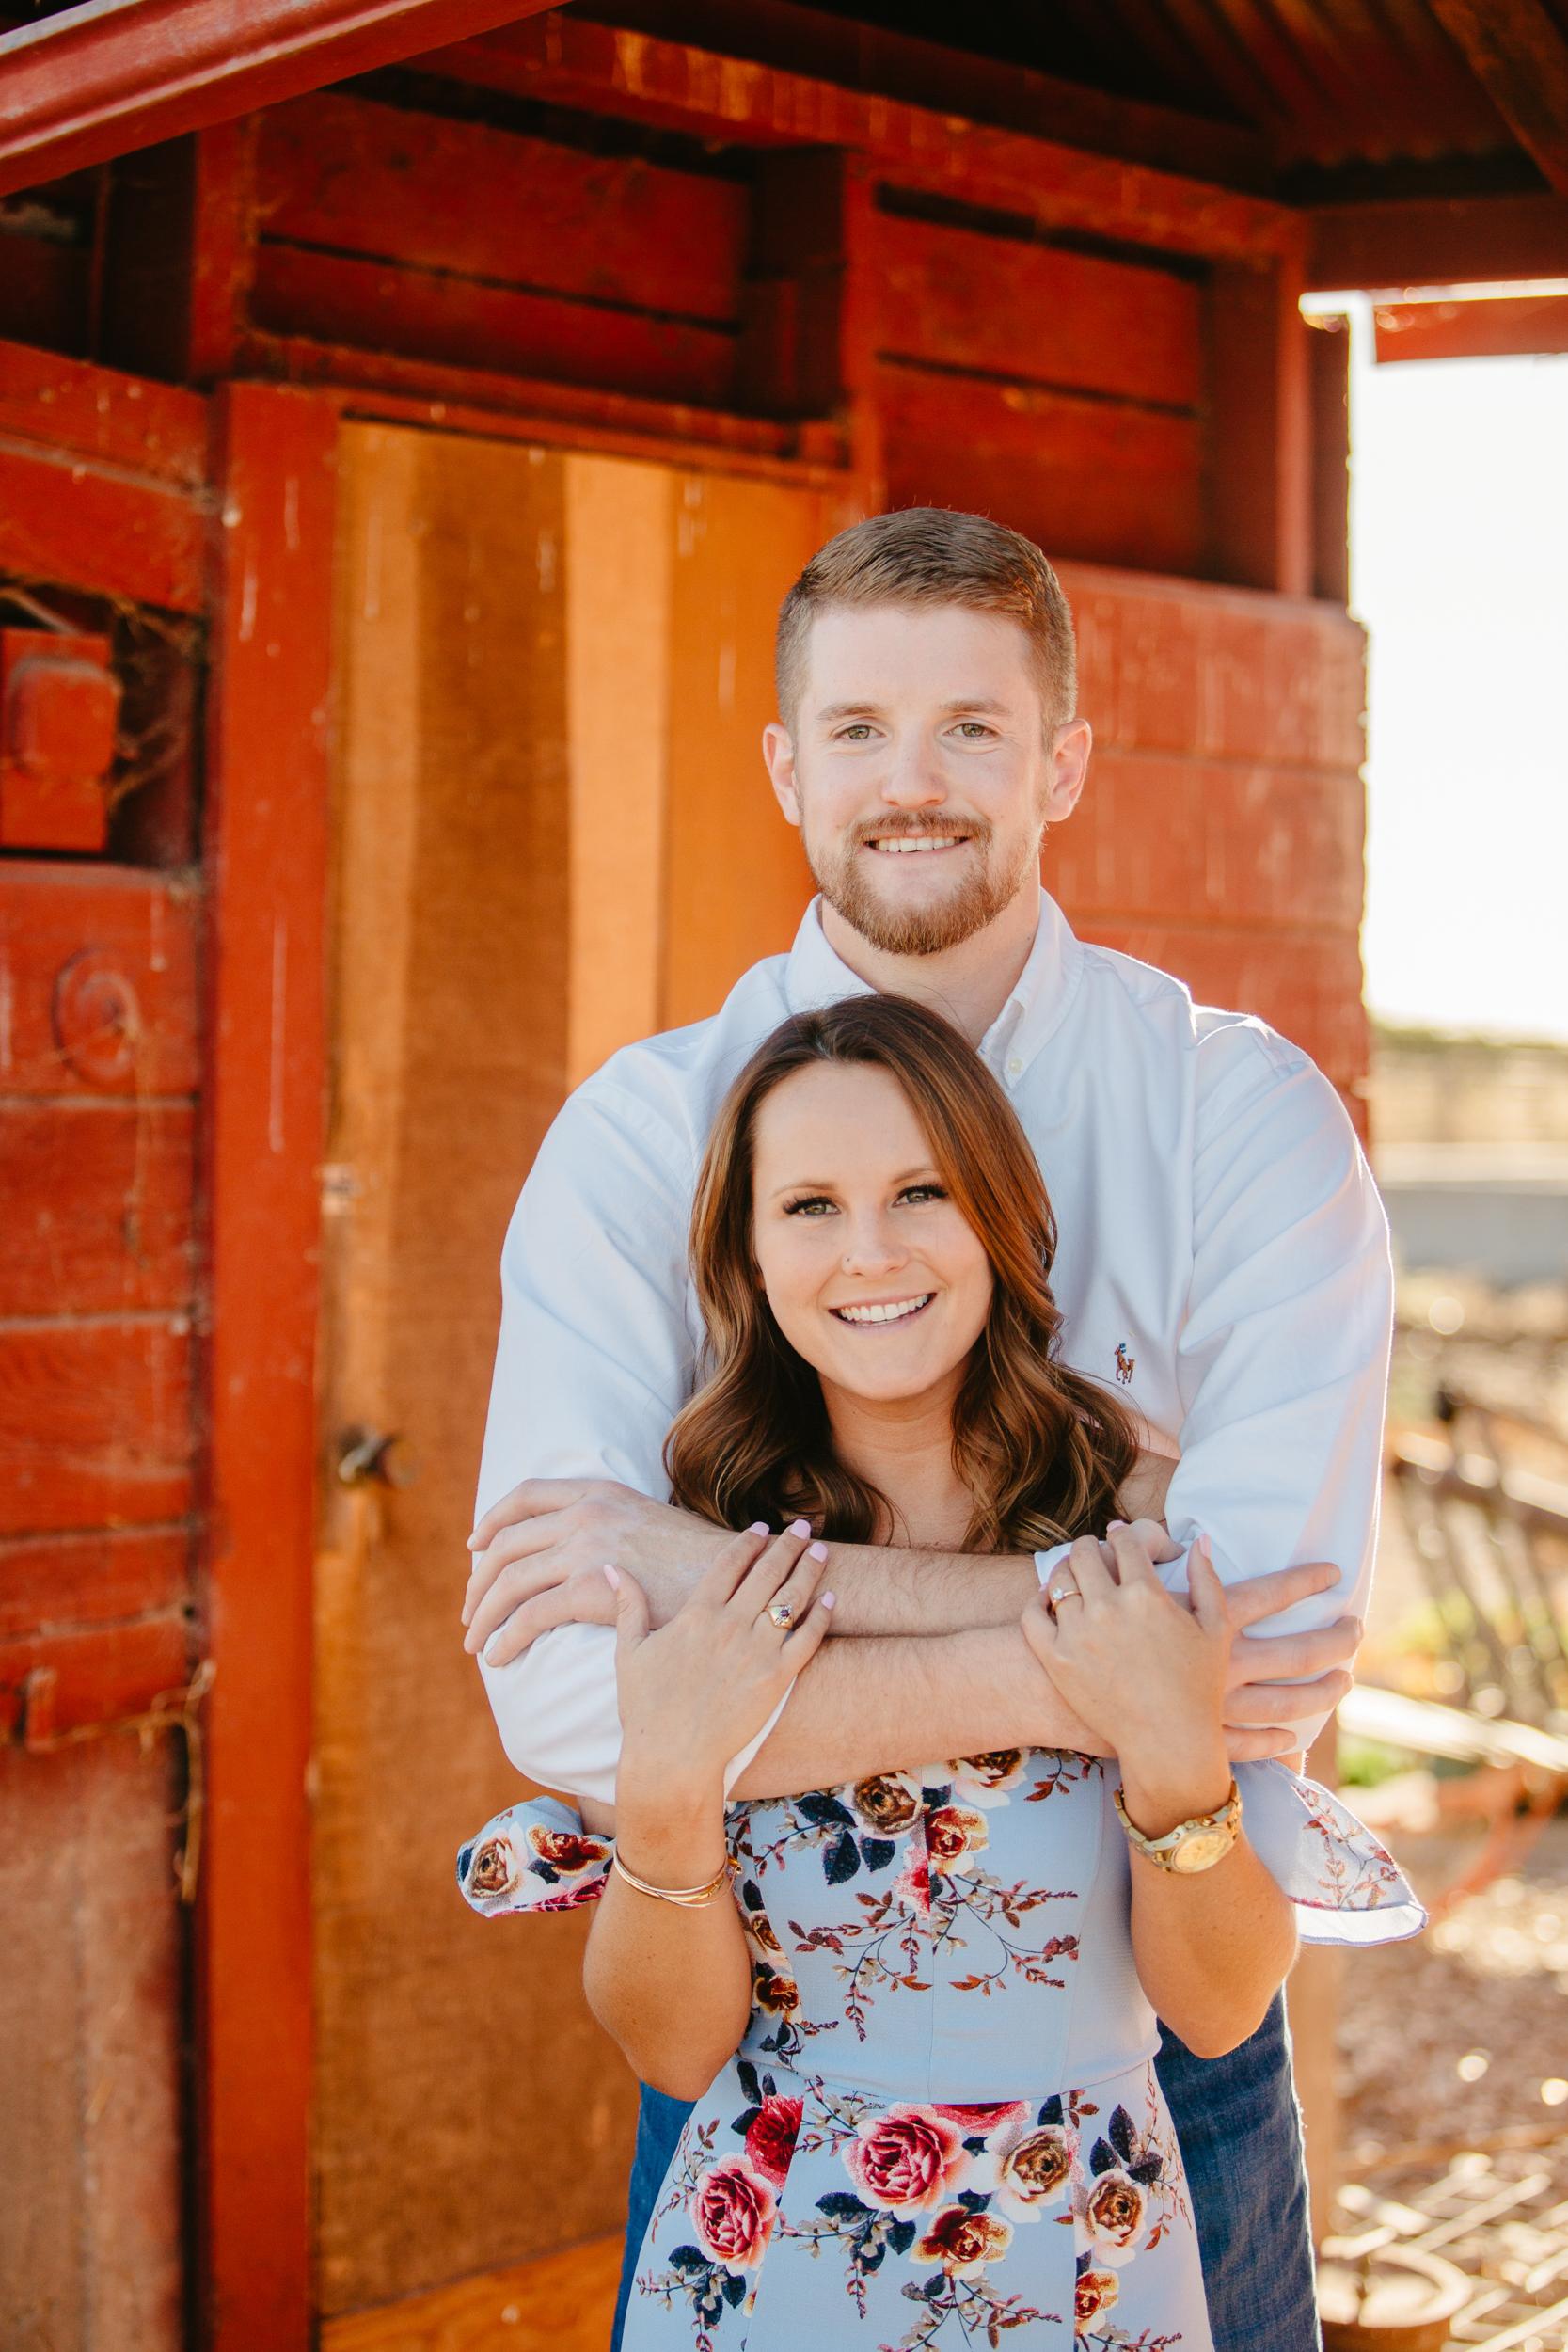 Engagement Photos-Ranalla Photo and Films-96.jpg